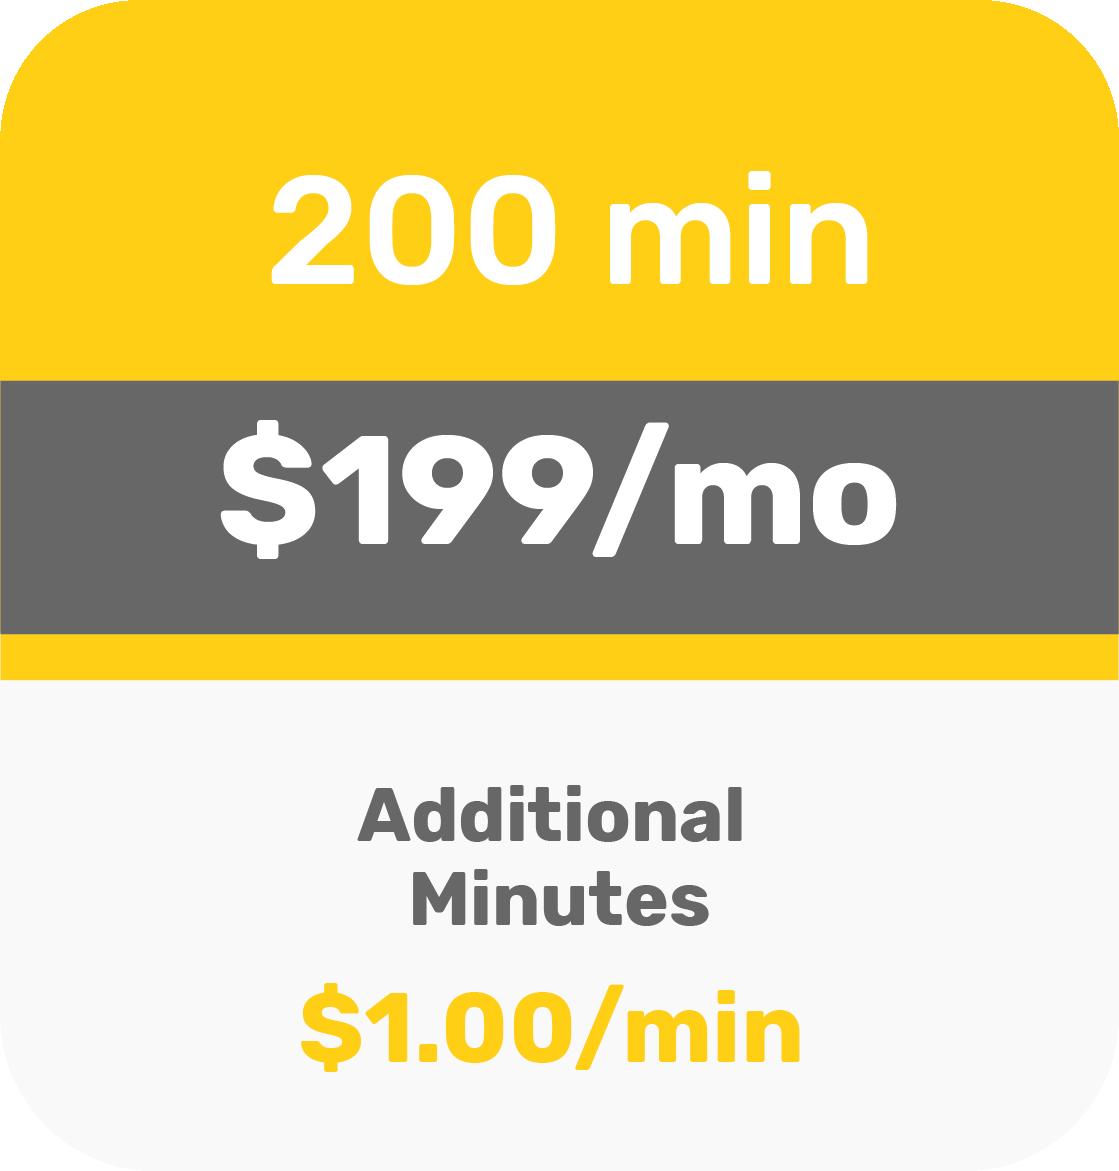 200 minutes - $199 per month